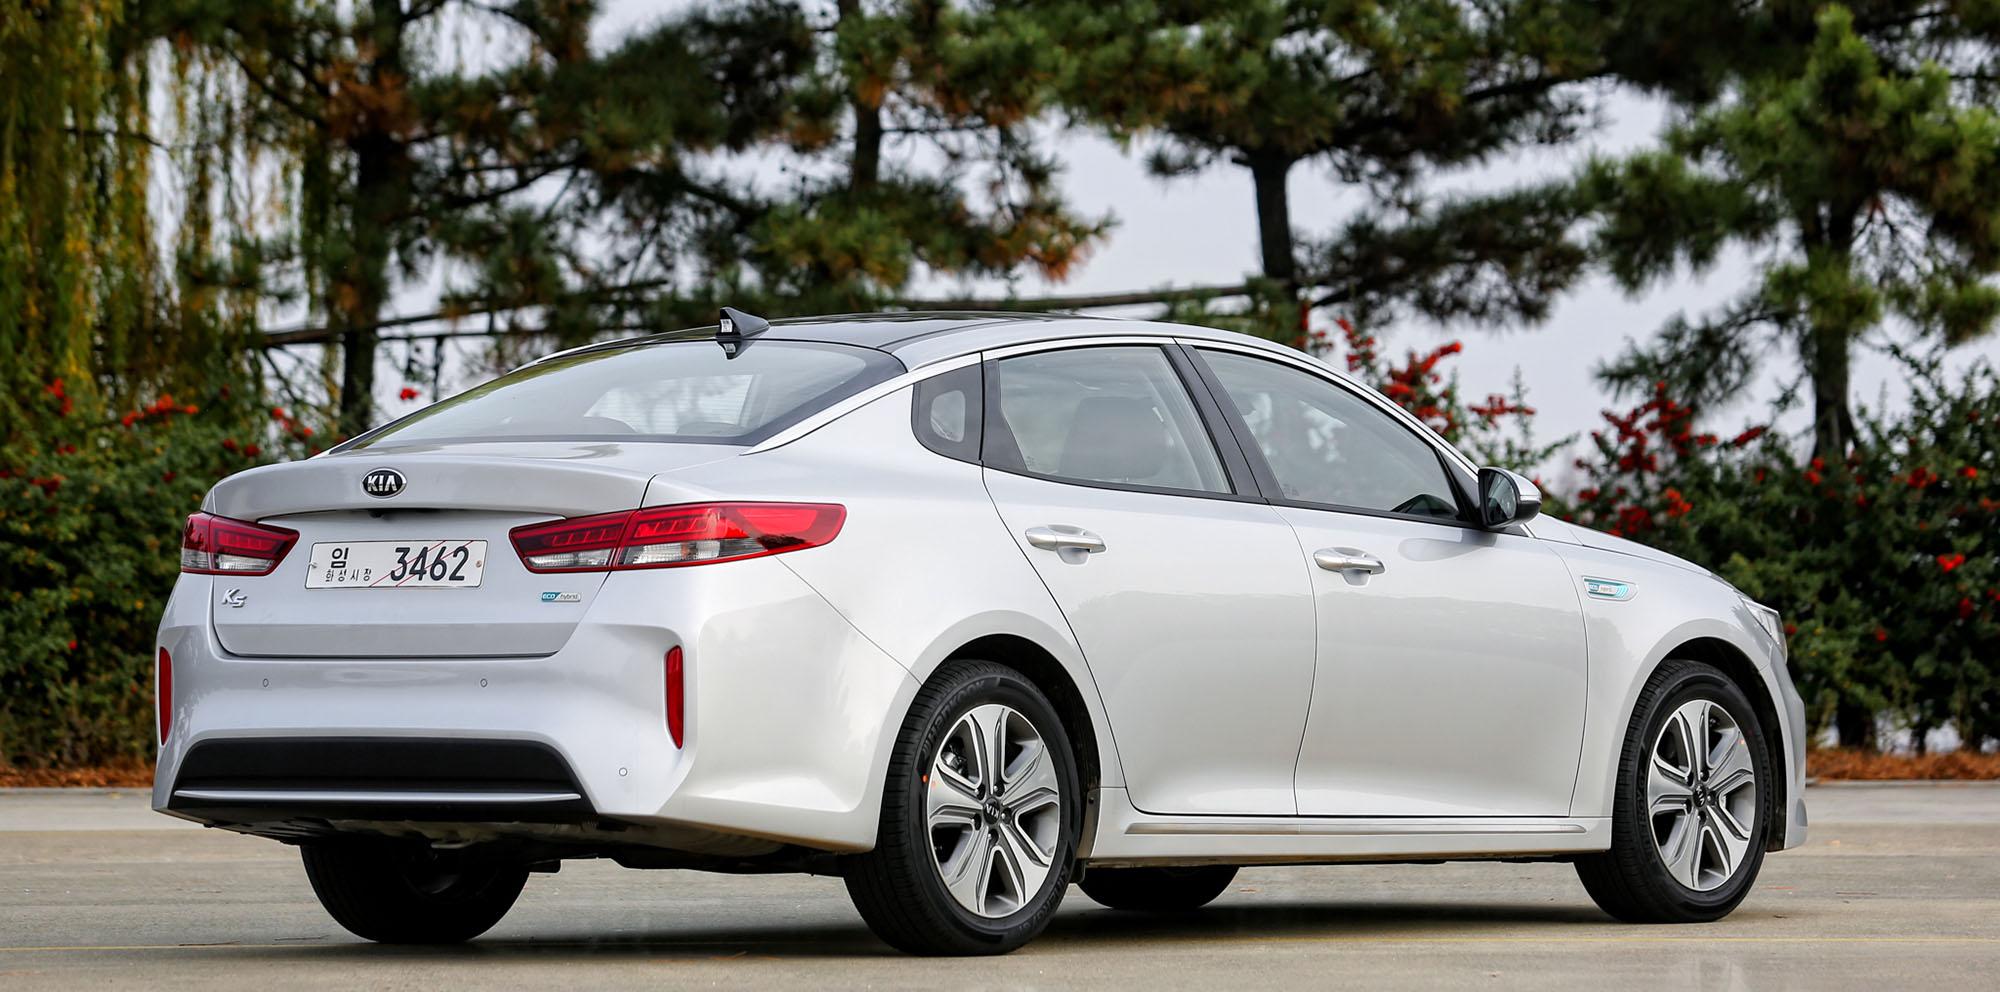 2016 Kia Optima Hybrid revealed, plug-in hybrid detailed ...